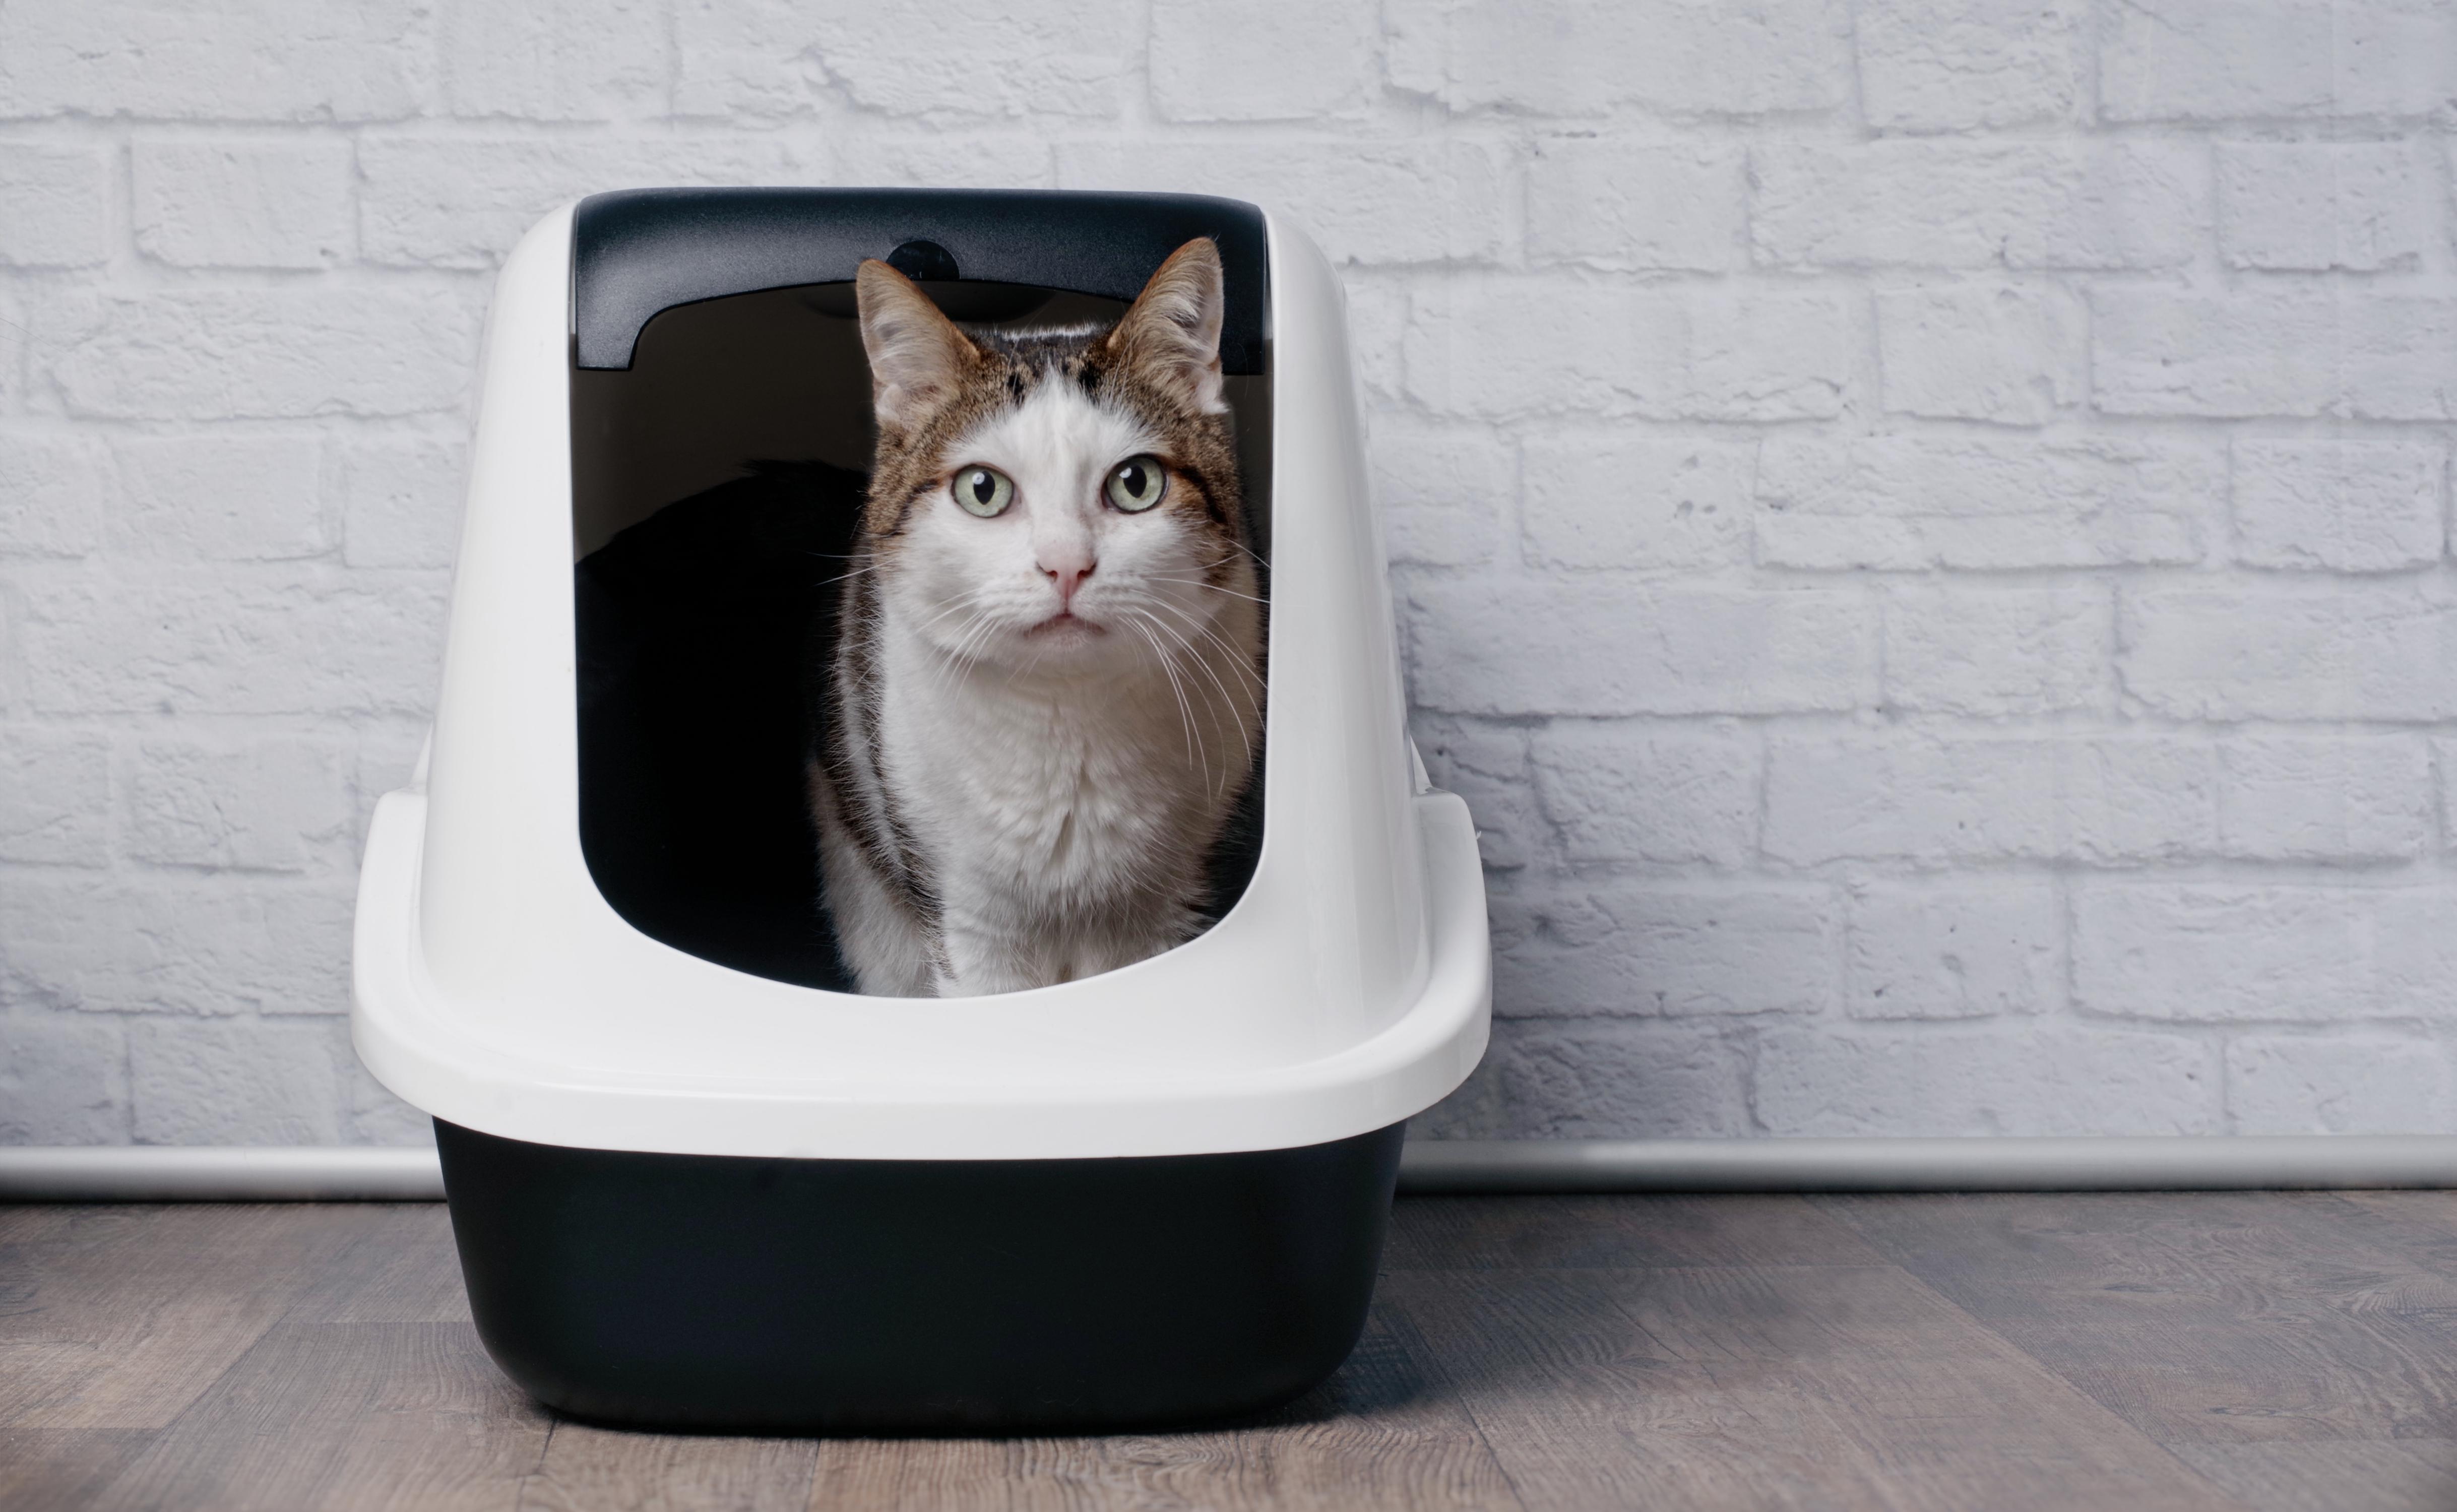 Tabby cat standing in litter box